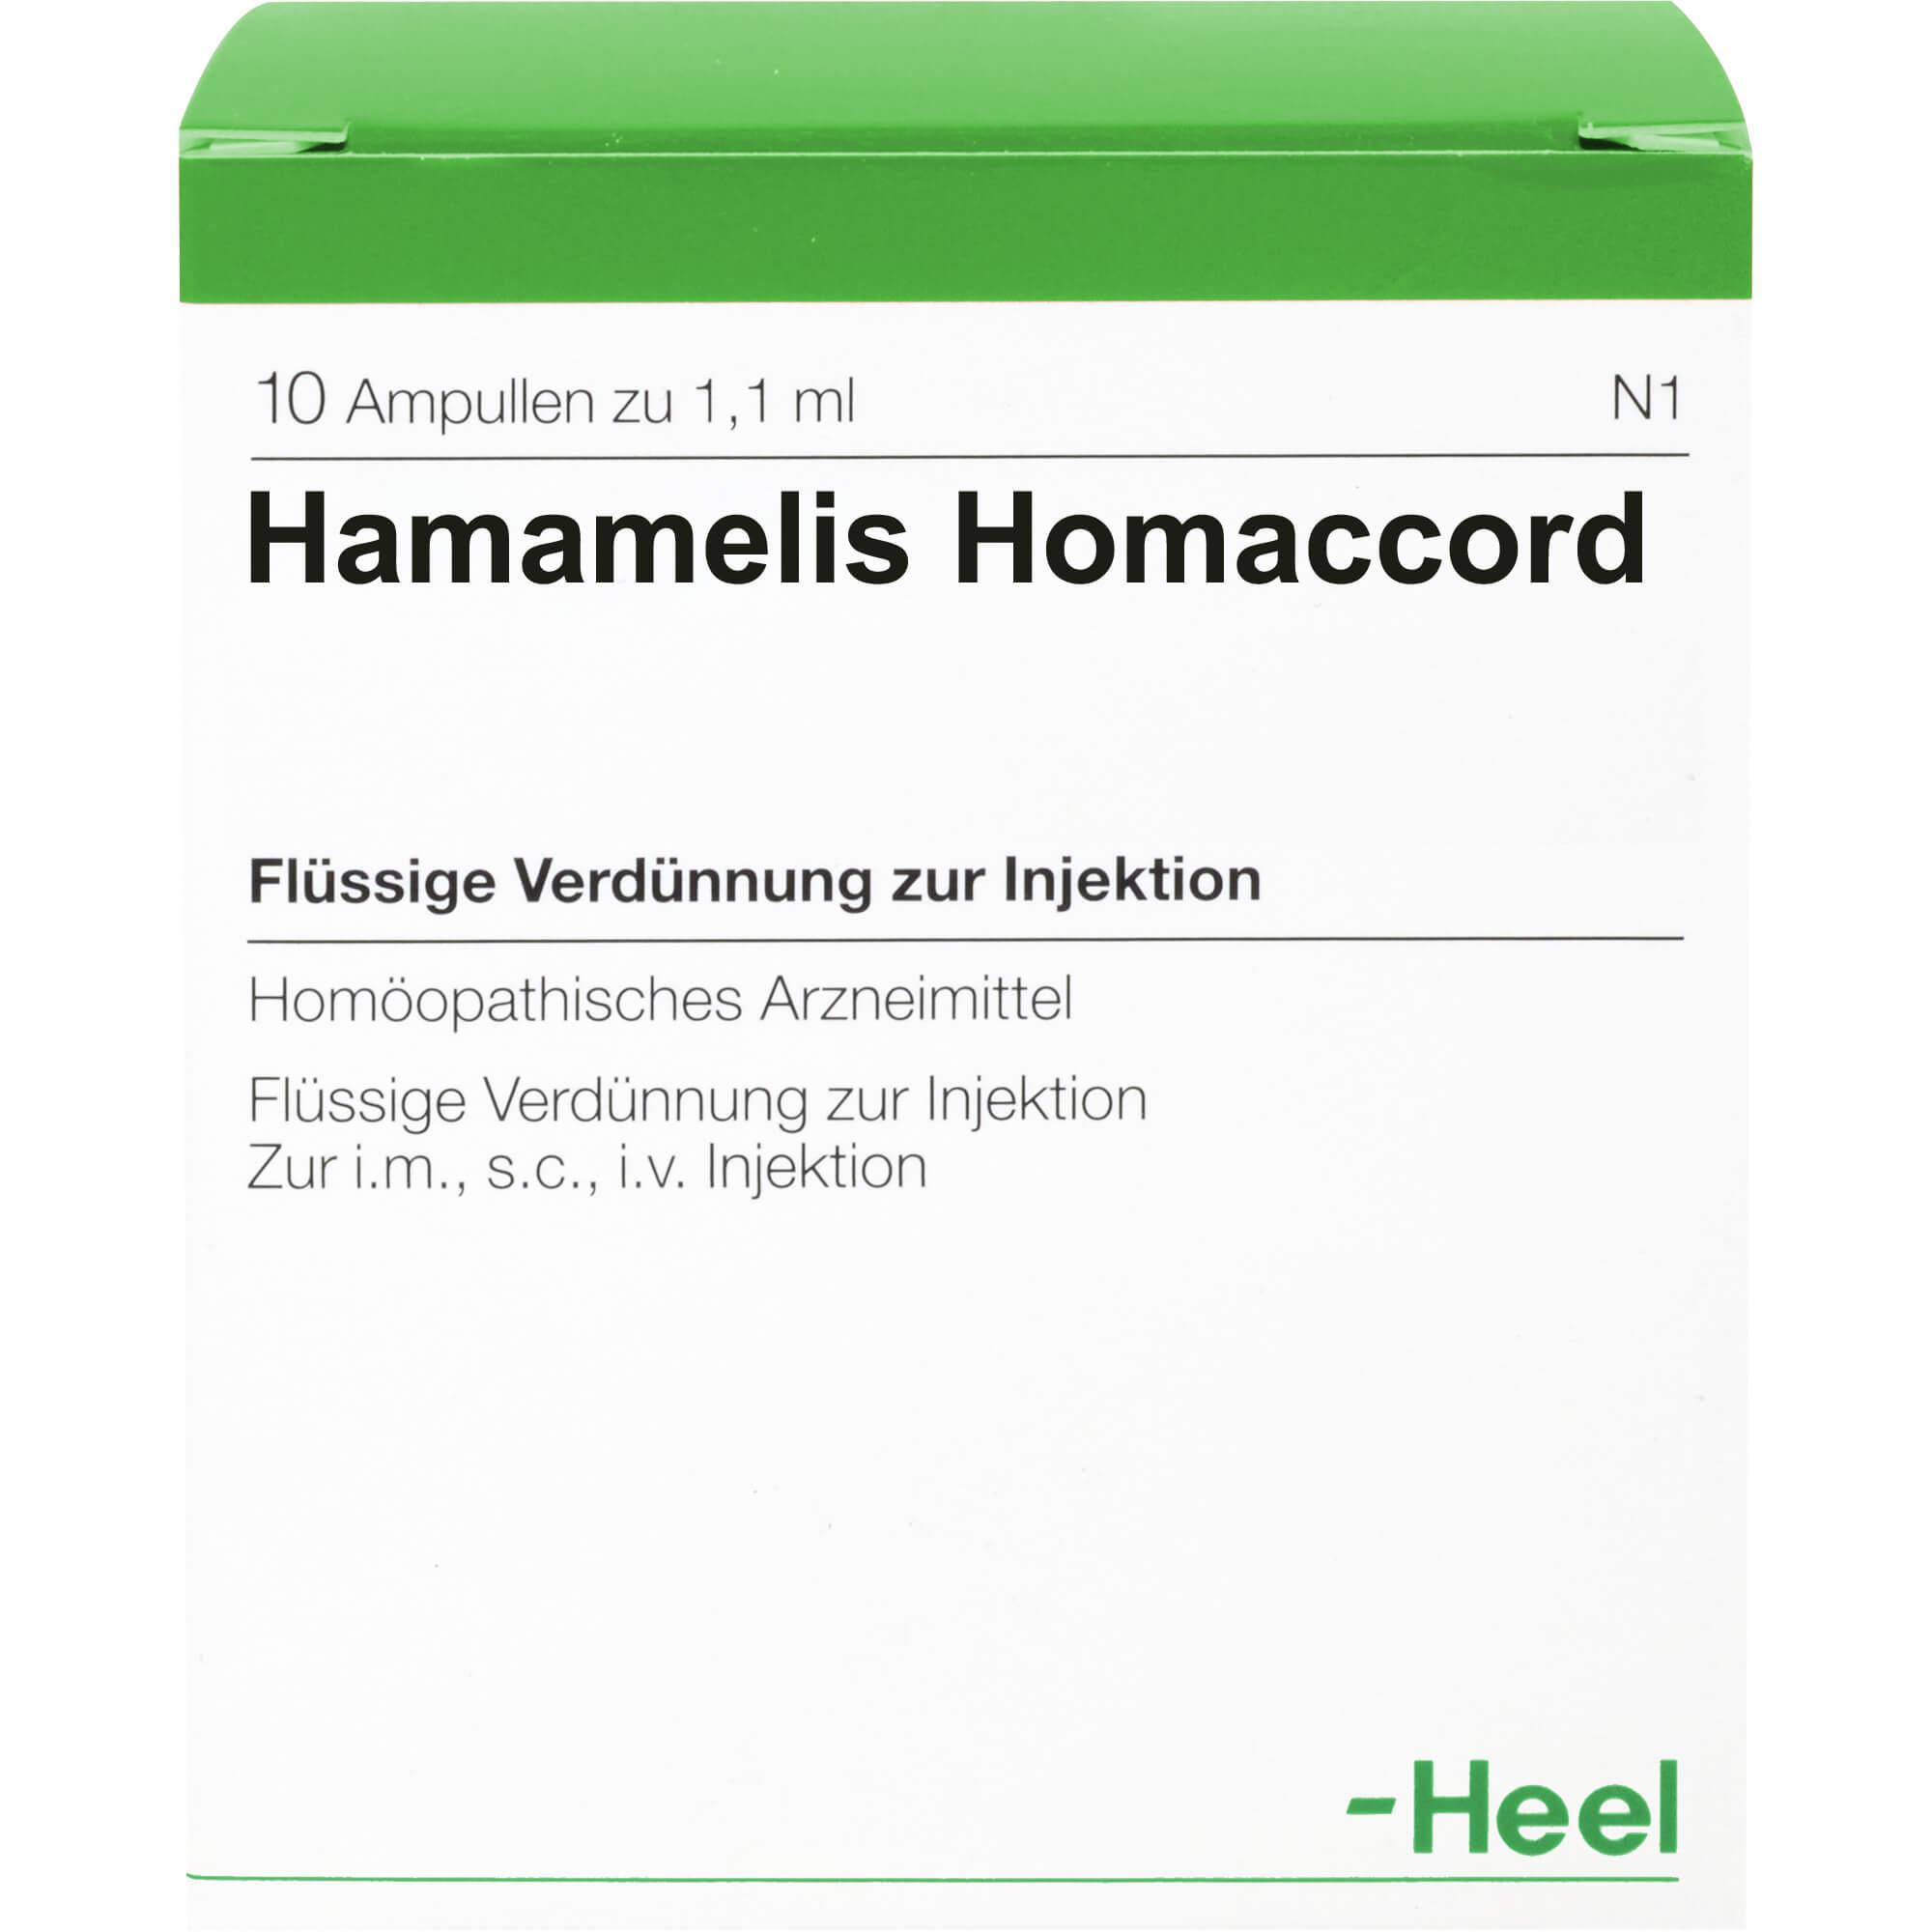 HAMAMELIS HOMACCORD Ampullen